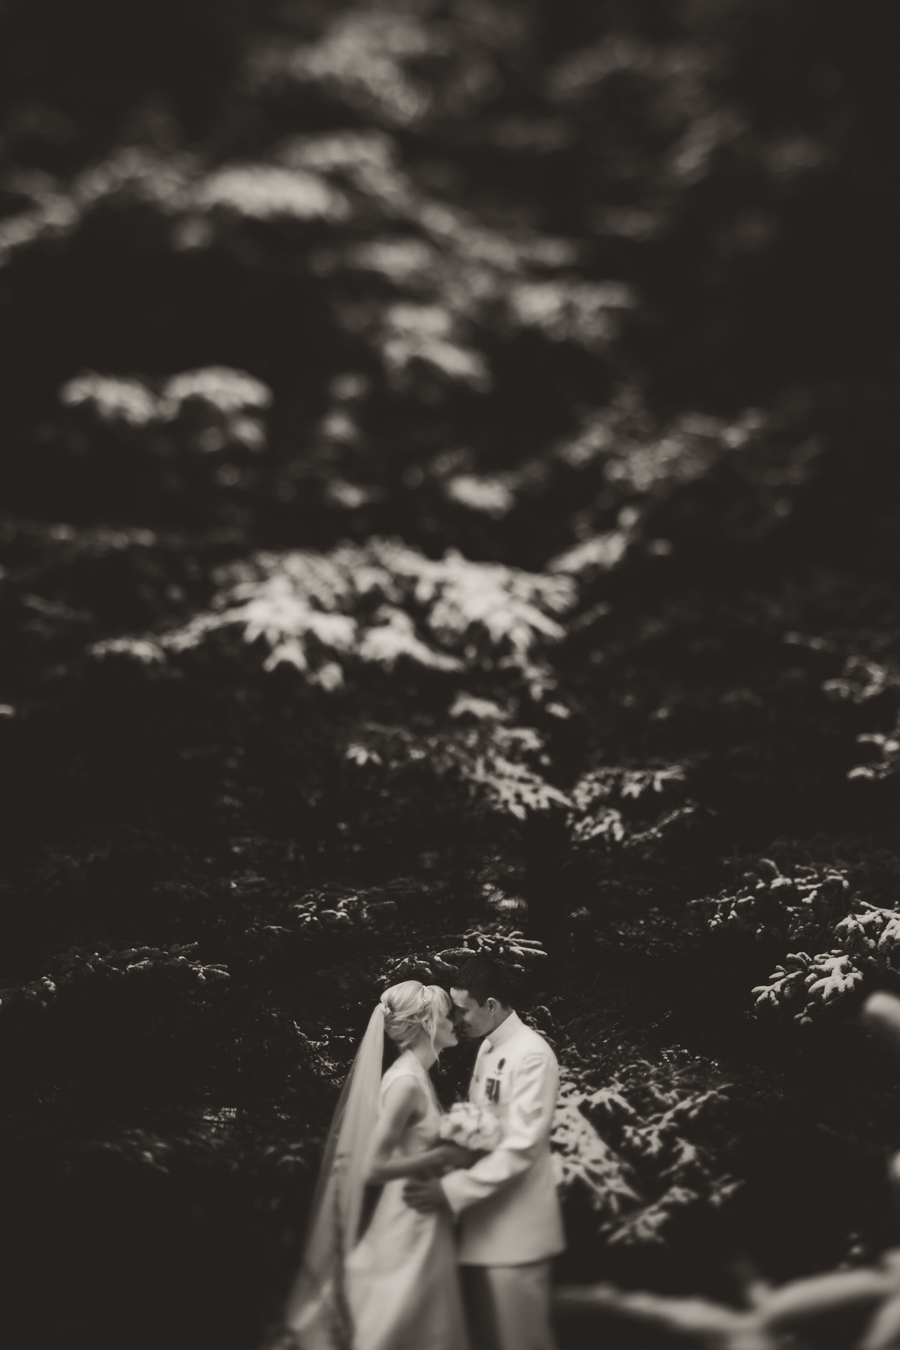 winter weddings, winter wedding photographer, winter weddings ontario, winter wedding peterborough, outdoor winter wedding photographer, ontario wedding photographer, peterborough wedding photographer, toronto wedding photographer, ash nayler photography, ash nayler